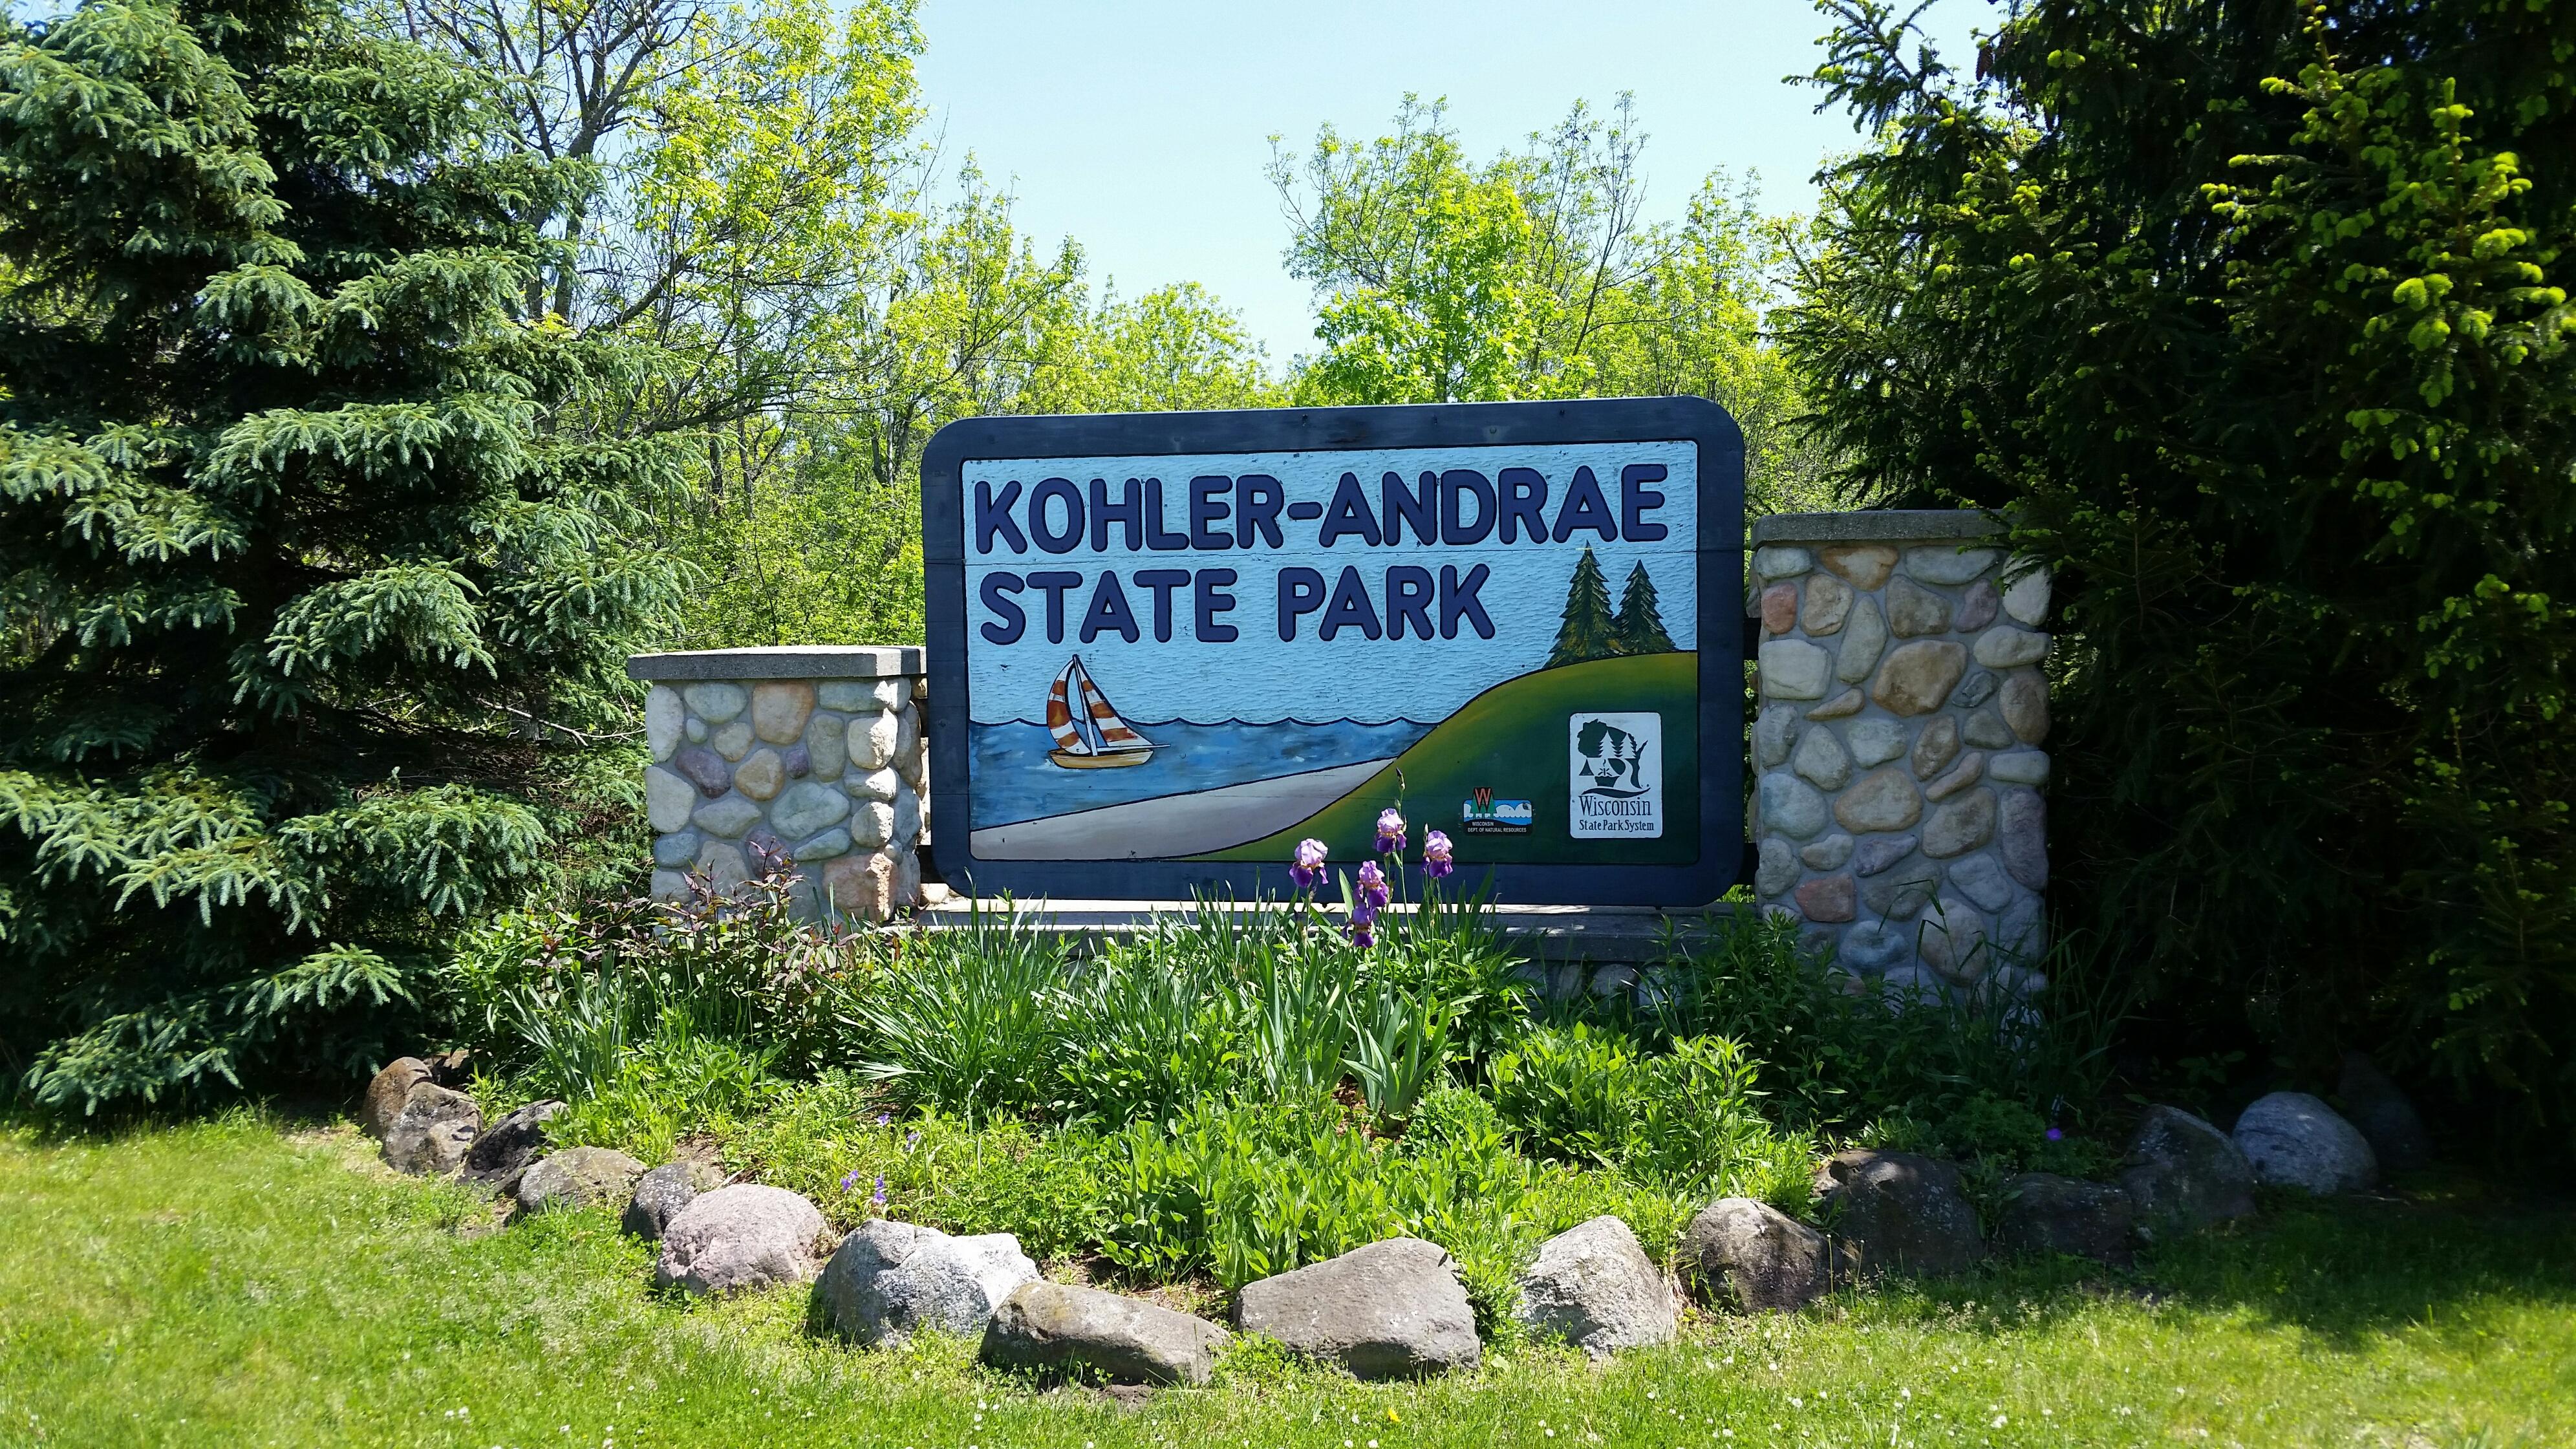 Kohler Golf Course Plan Faces Key Vote Monday In Sheboygan ...